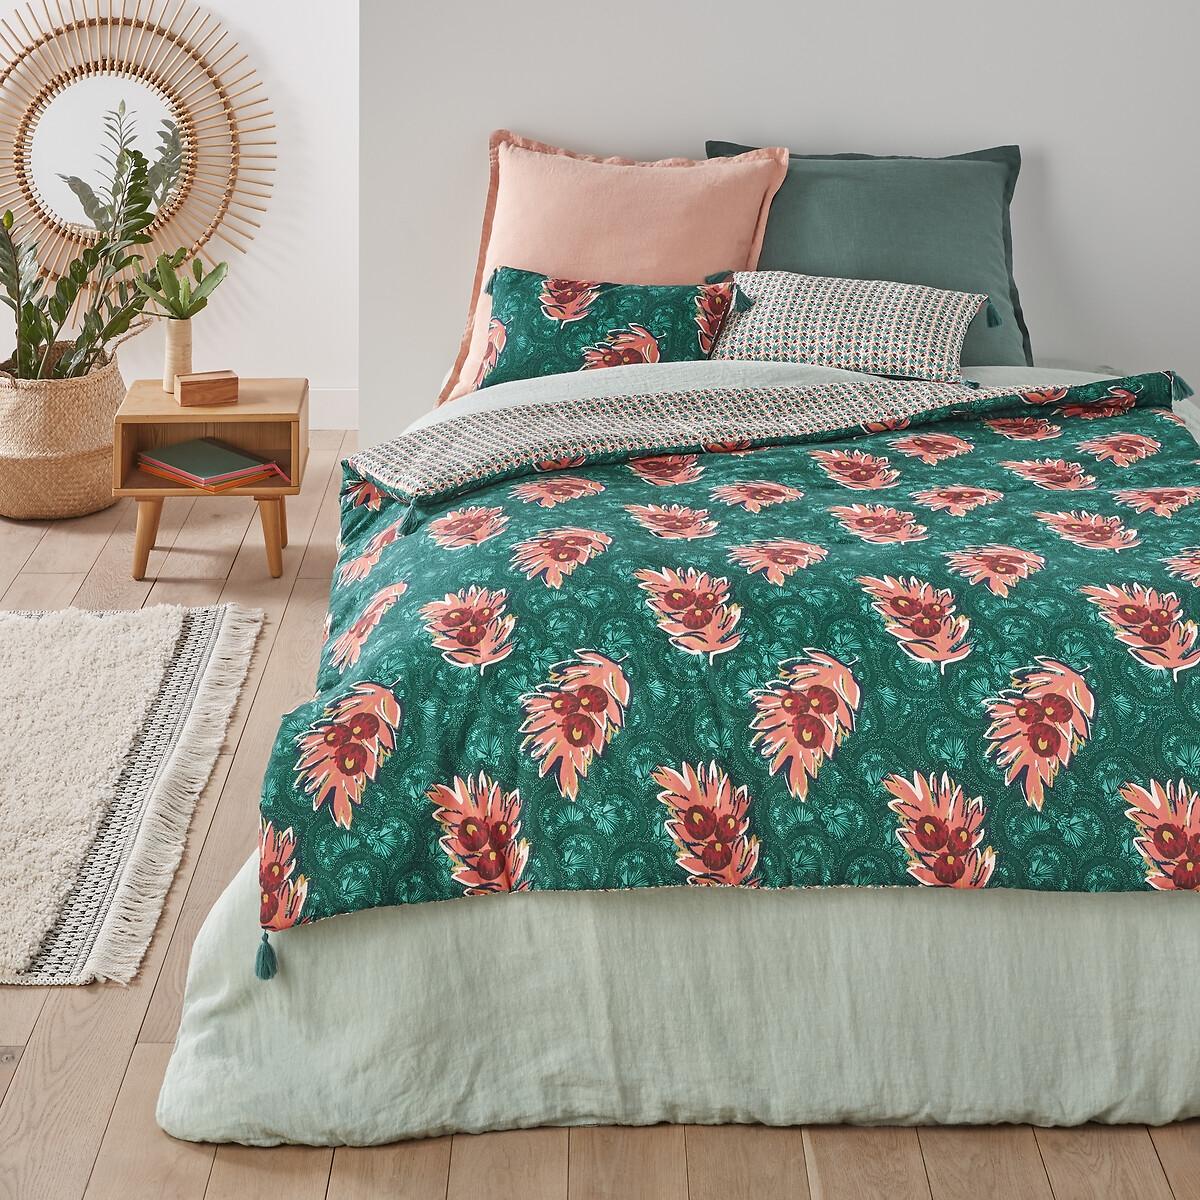 Одеяло LaRedoute С рисунком из 100 осветленного хлопка Sami 90 x 190 см синий